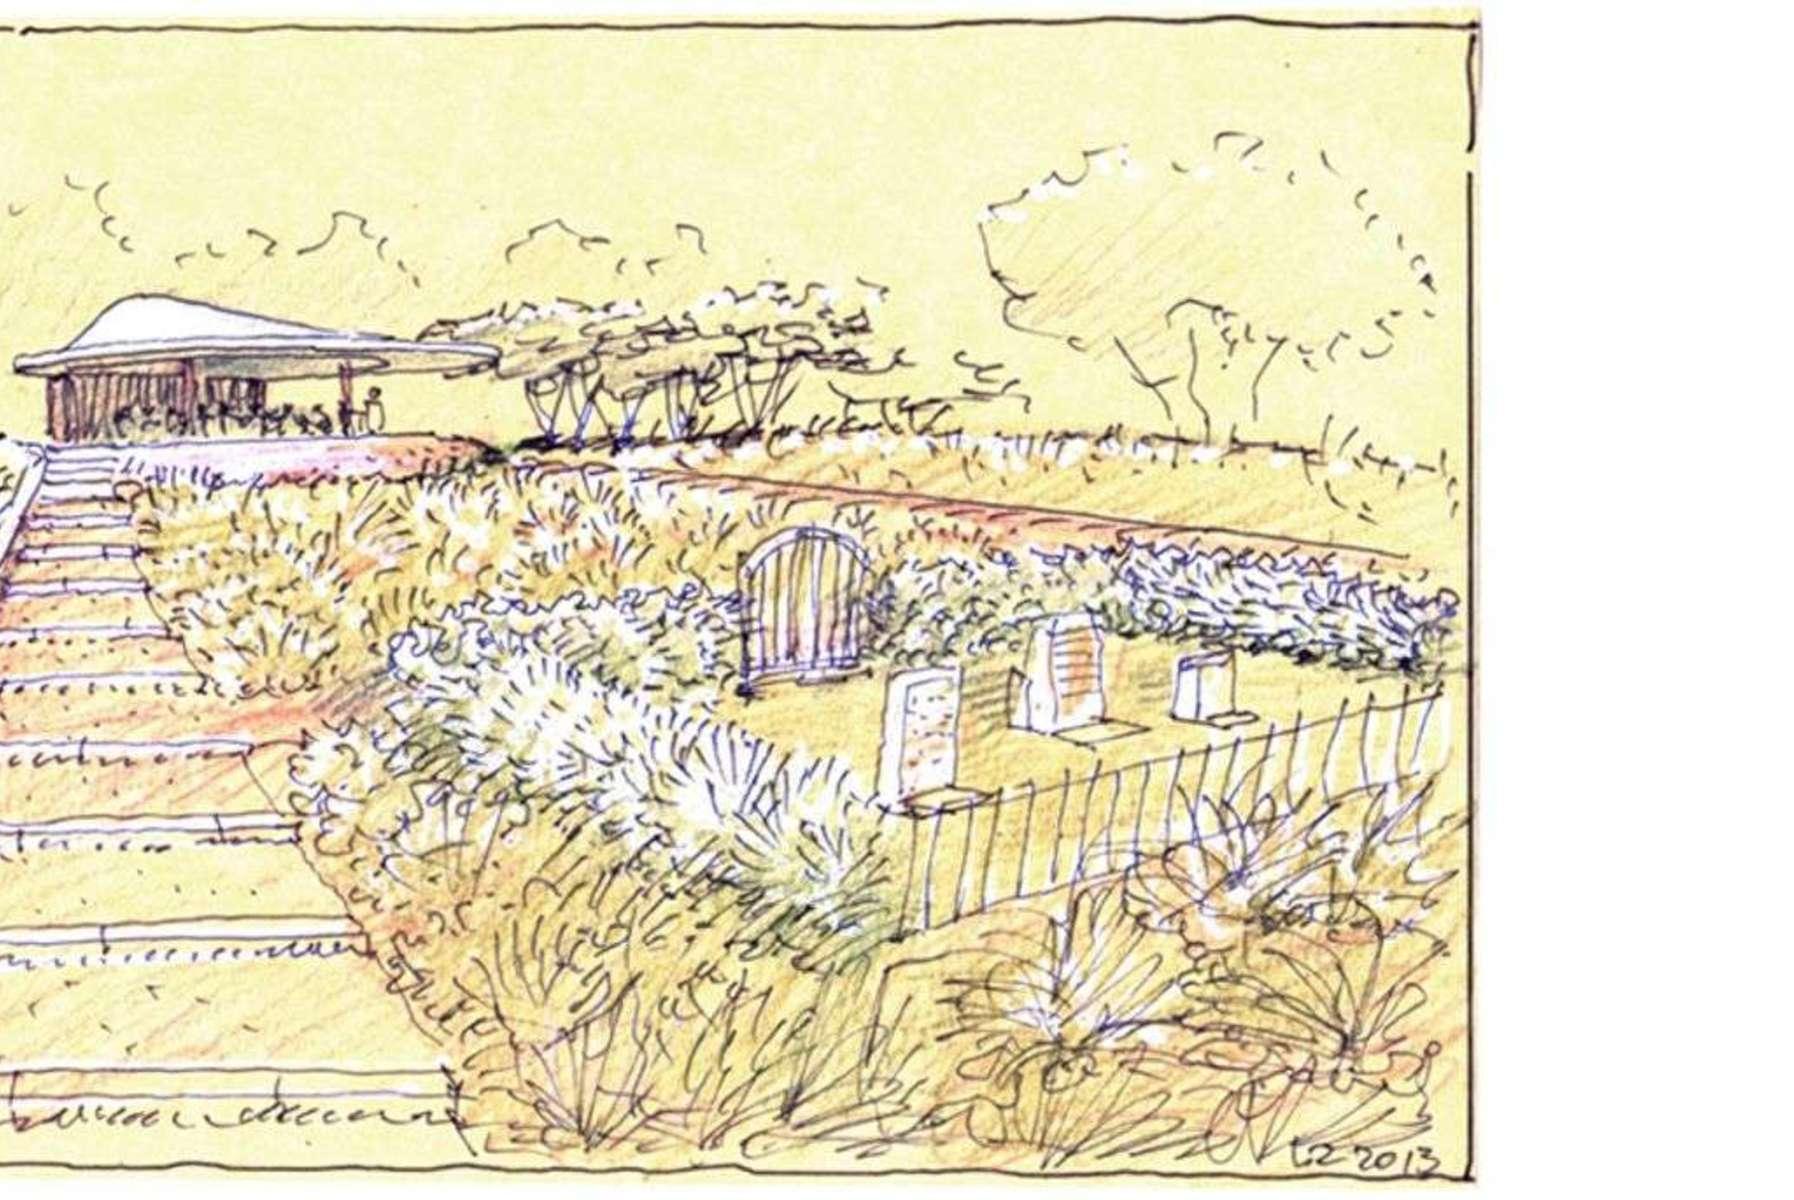 Luigi Rosselli e The Great Wall of WA (Western Australia)